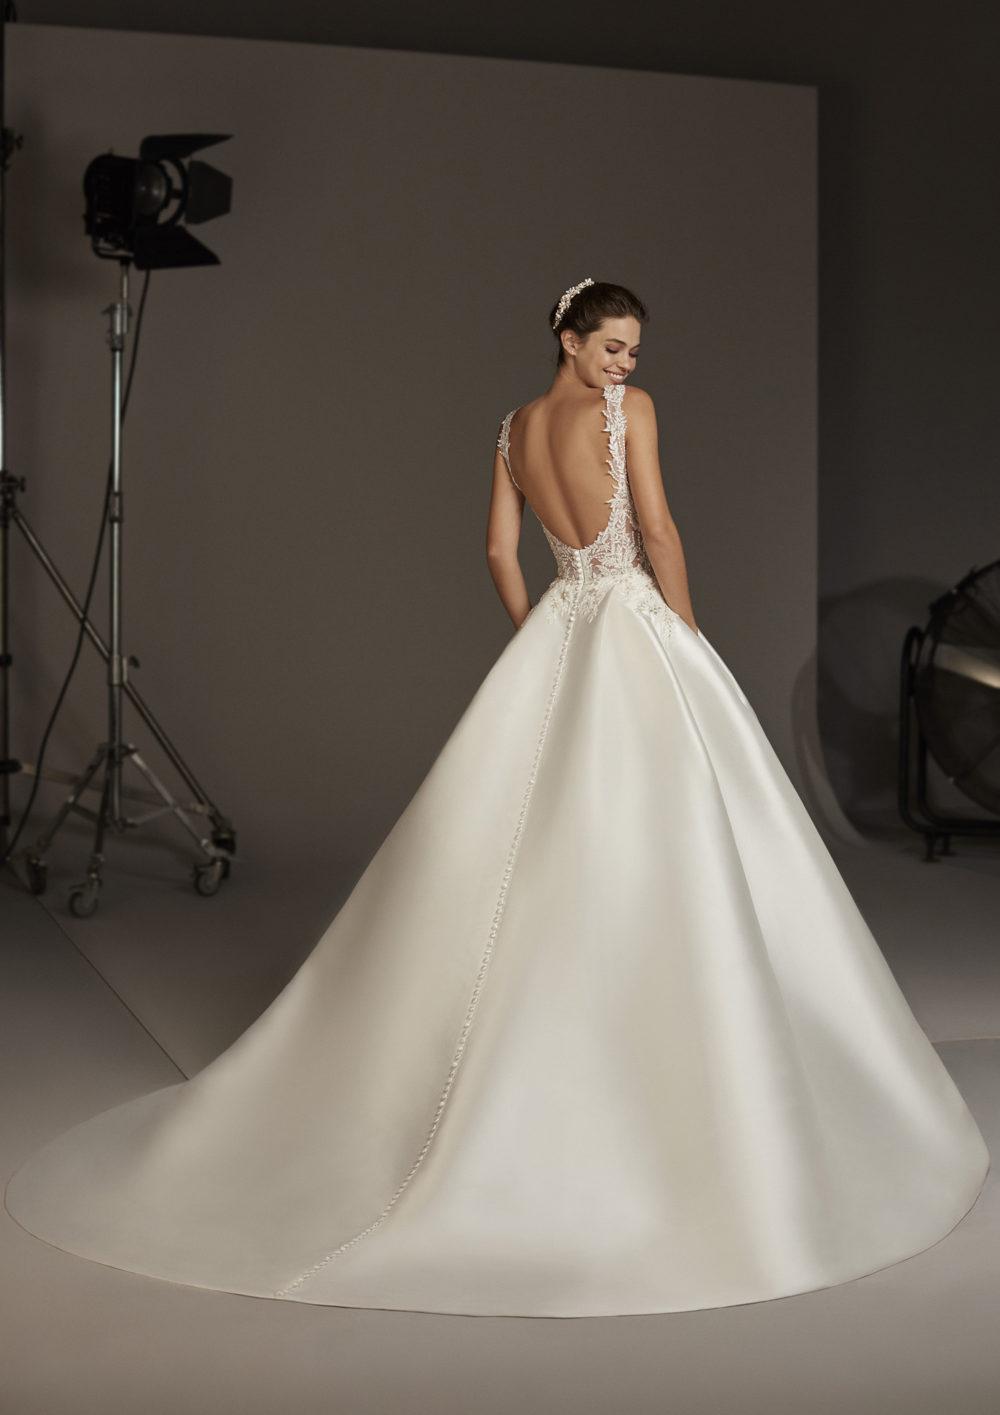 Mariages: abito da sposa Pronovias 2020 a Vicenza, Verona, Padova, Veneto VIRGO